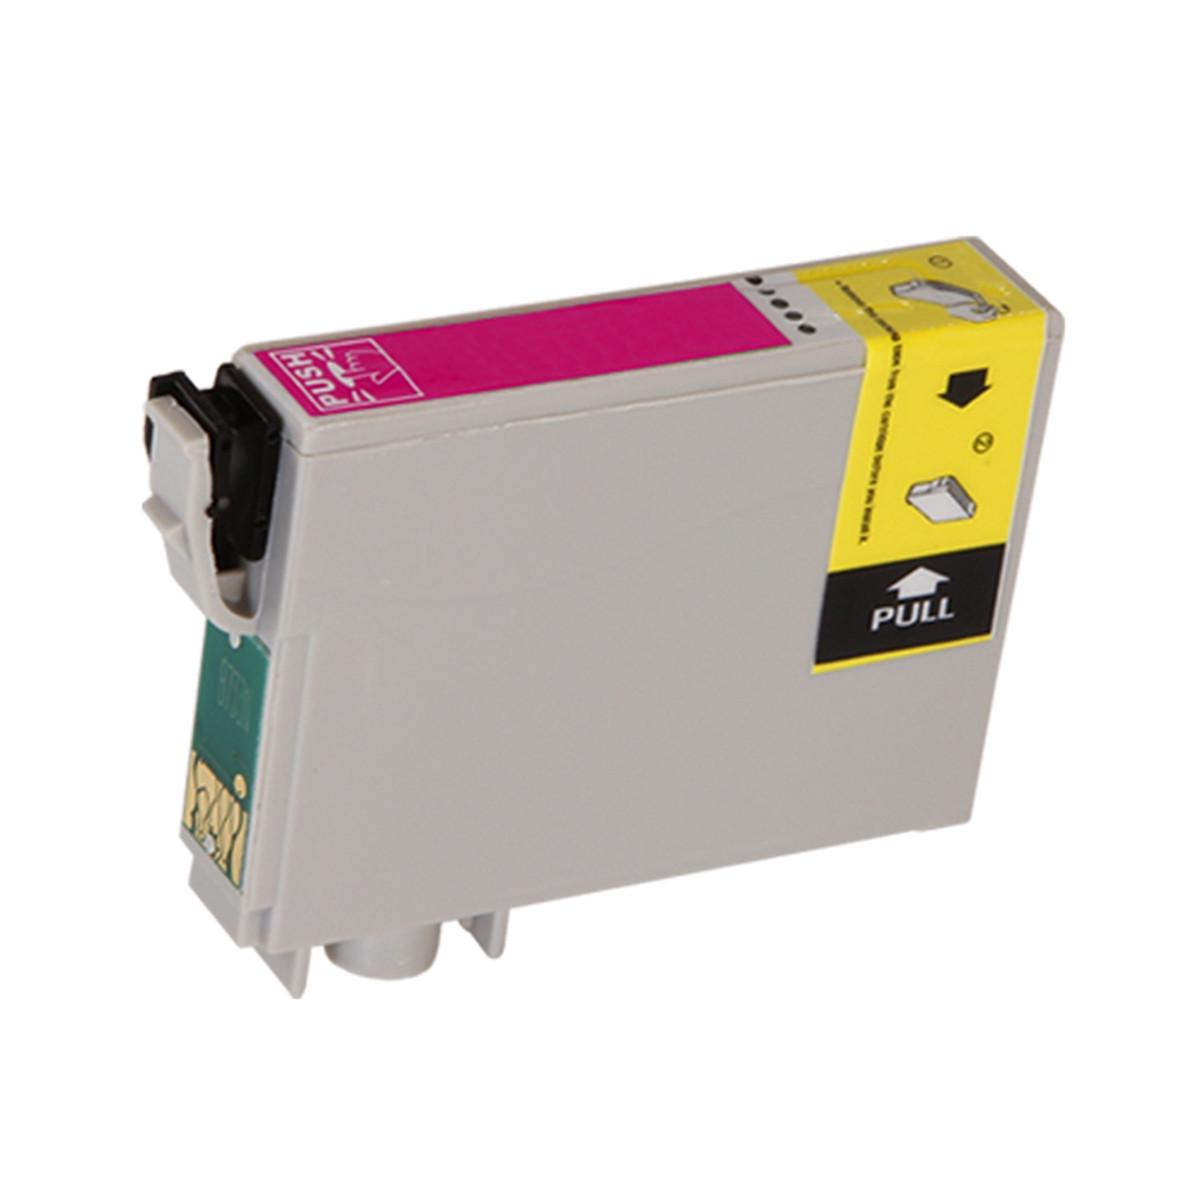 Cartucho de Tinta Epson Magenta T1033 T103320 T103 | TX600FW TX550FW T40W T1110 | Compatível 14 ml